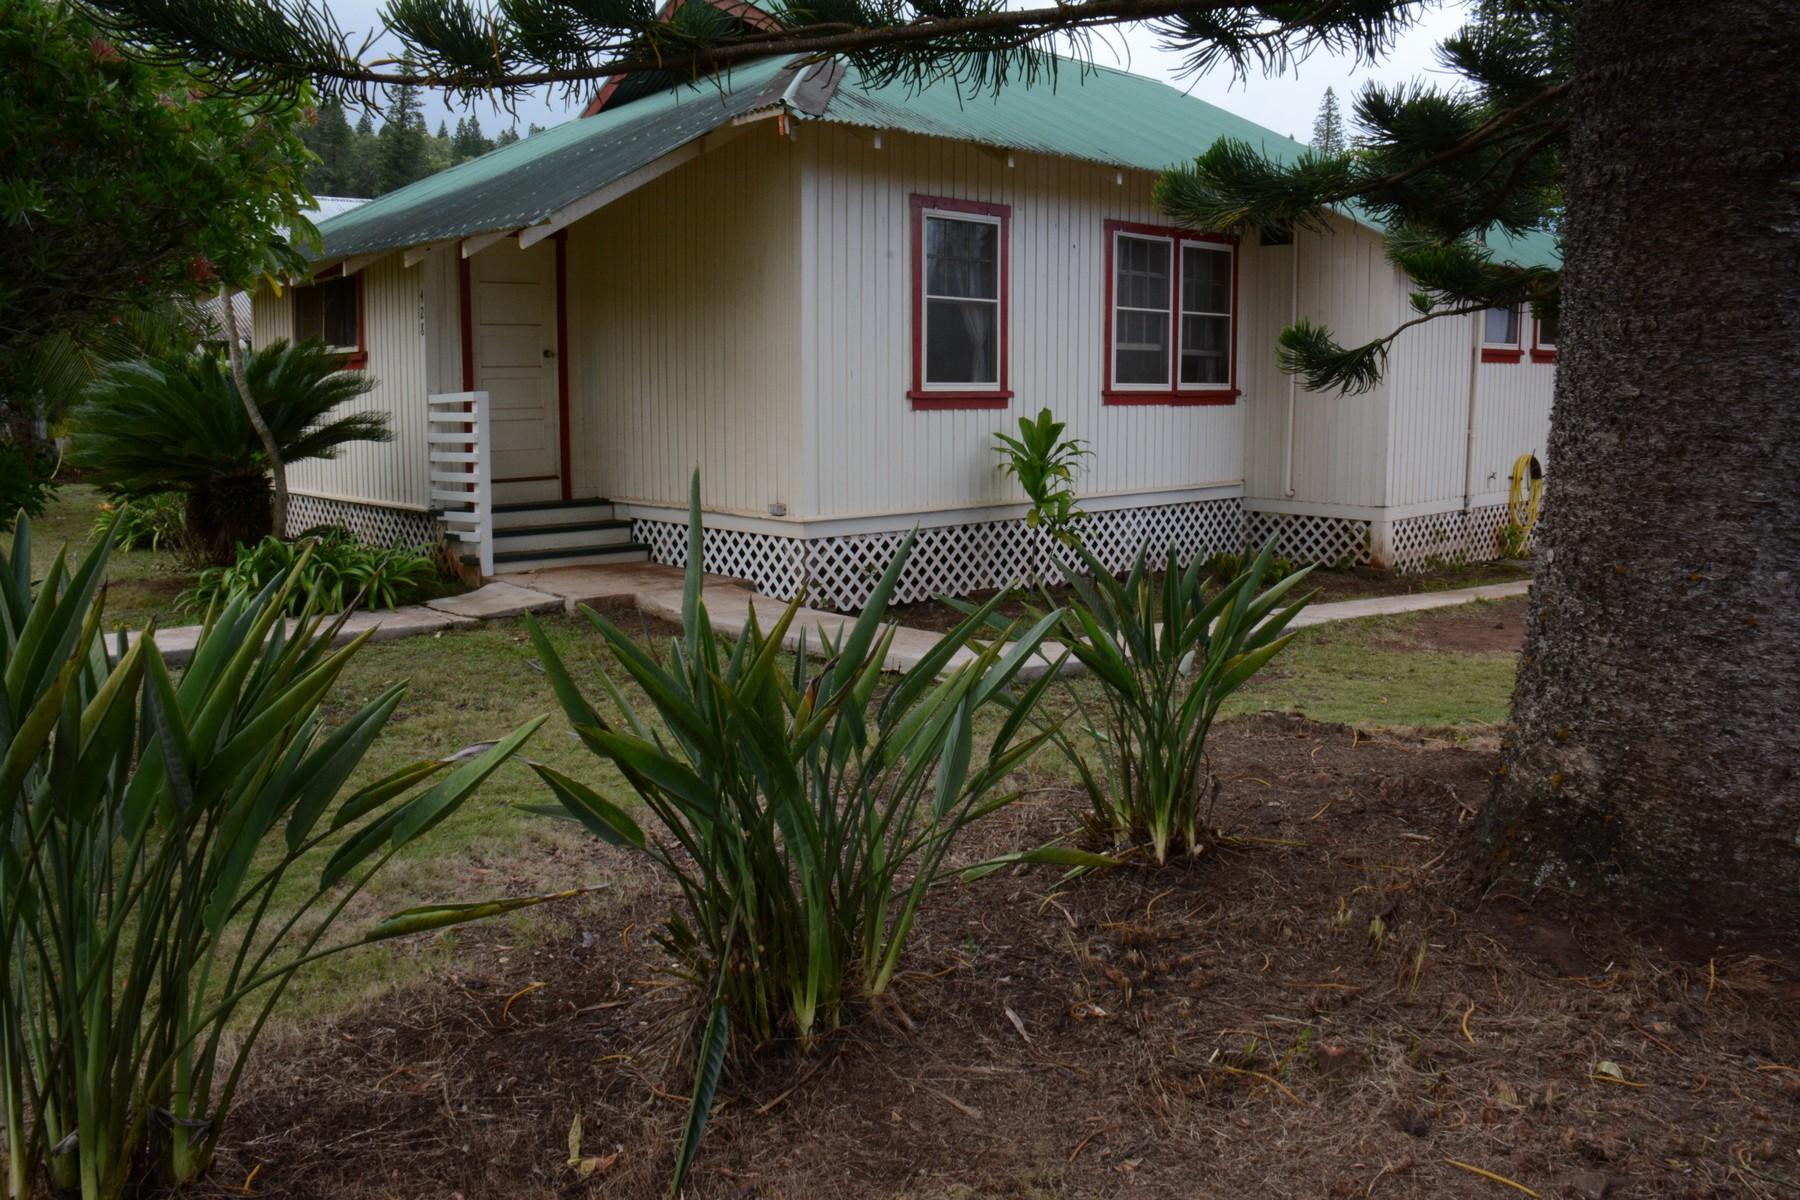 独户住宅 为 销售 在 Lanai Plantation Home Get-A-Way 428 Fifth Street Lanai City, 夏威夷 96763 美国